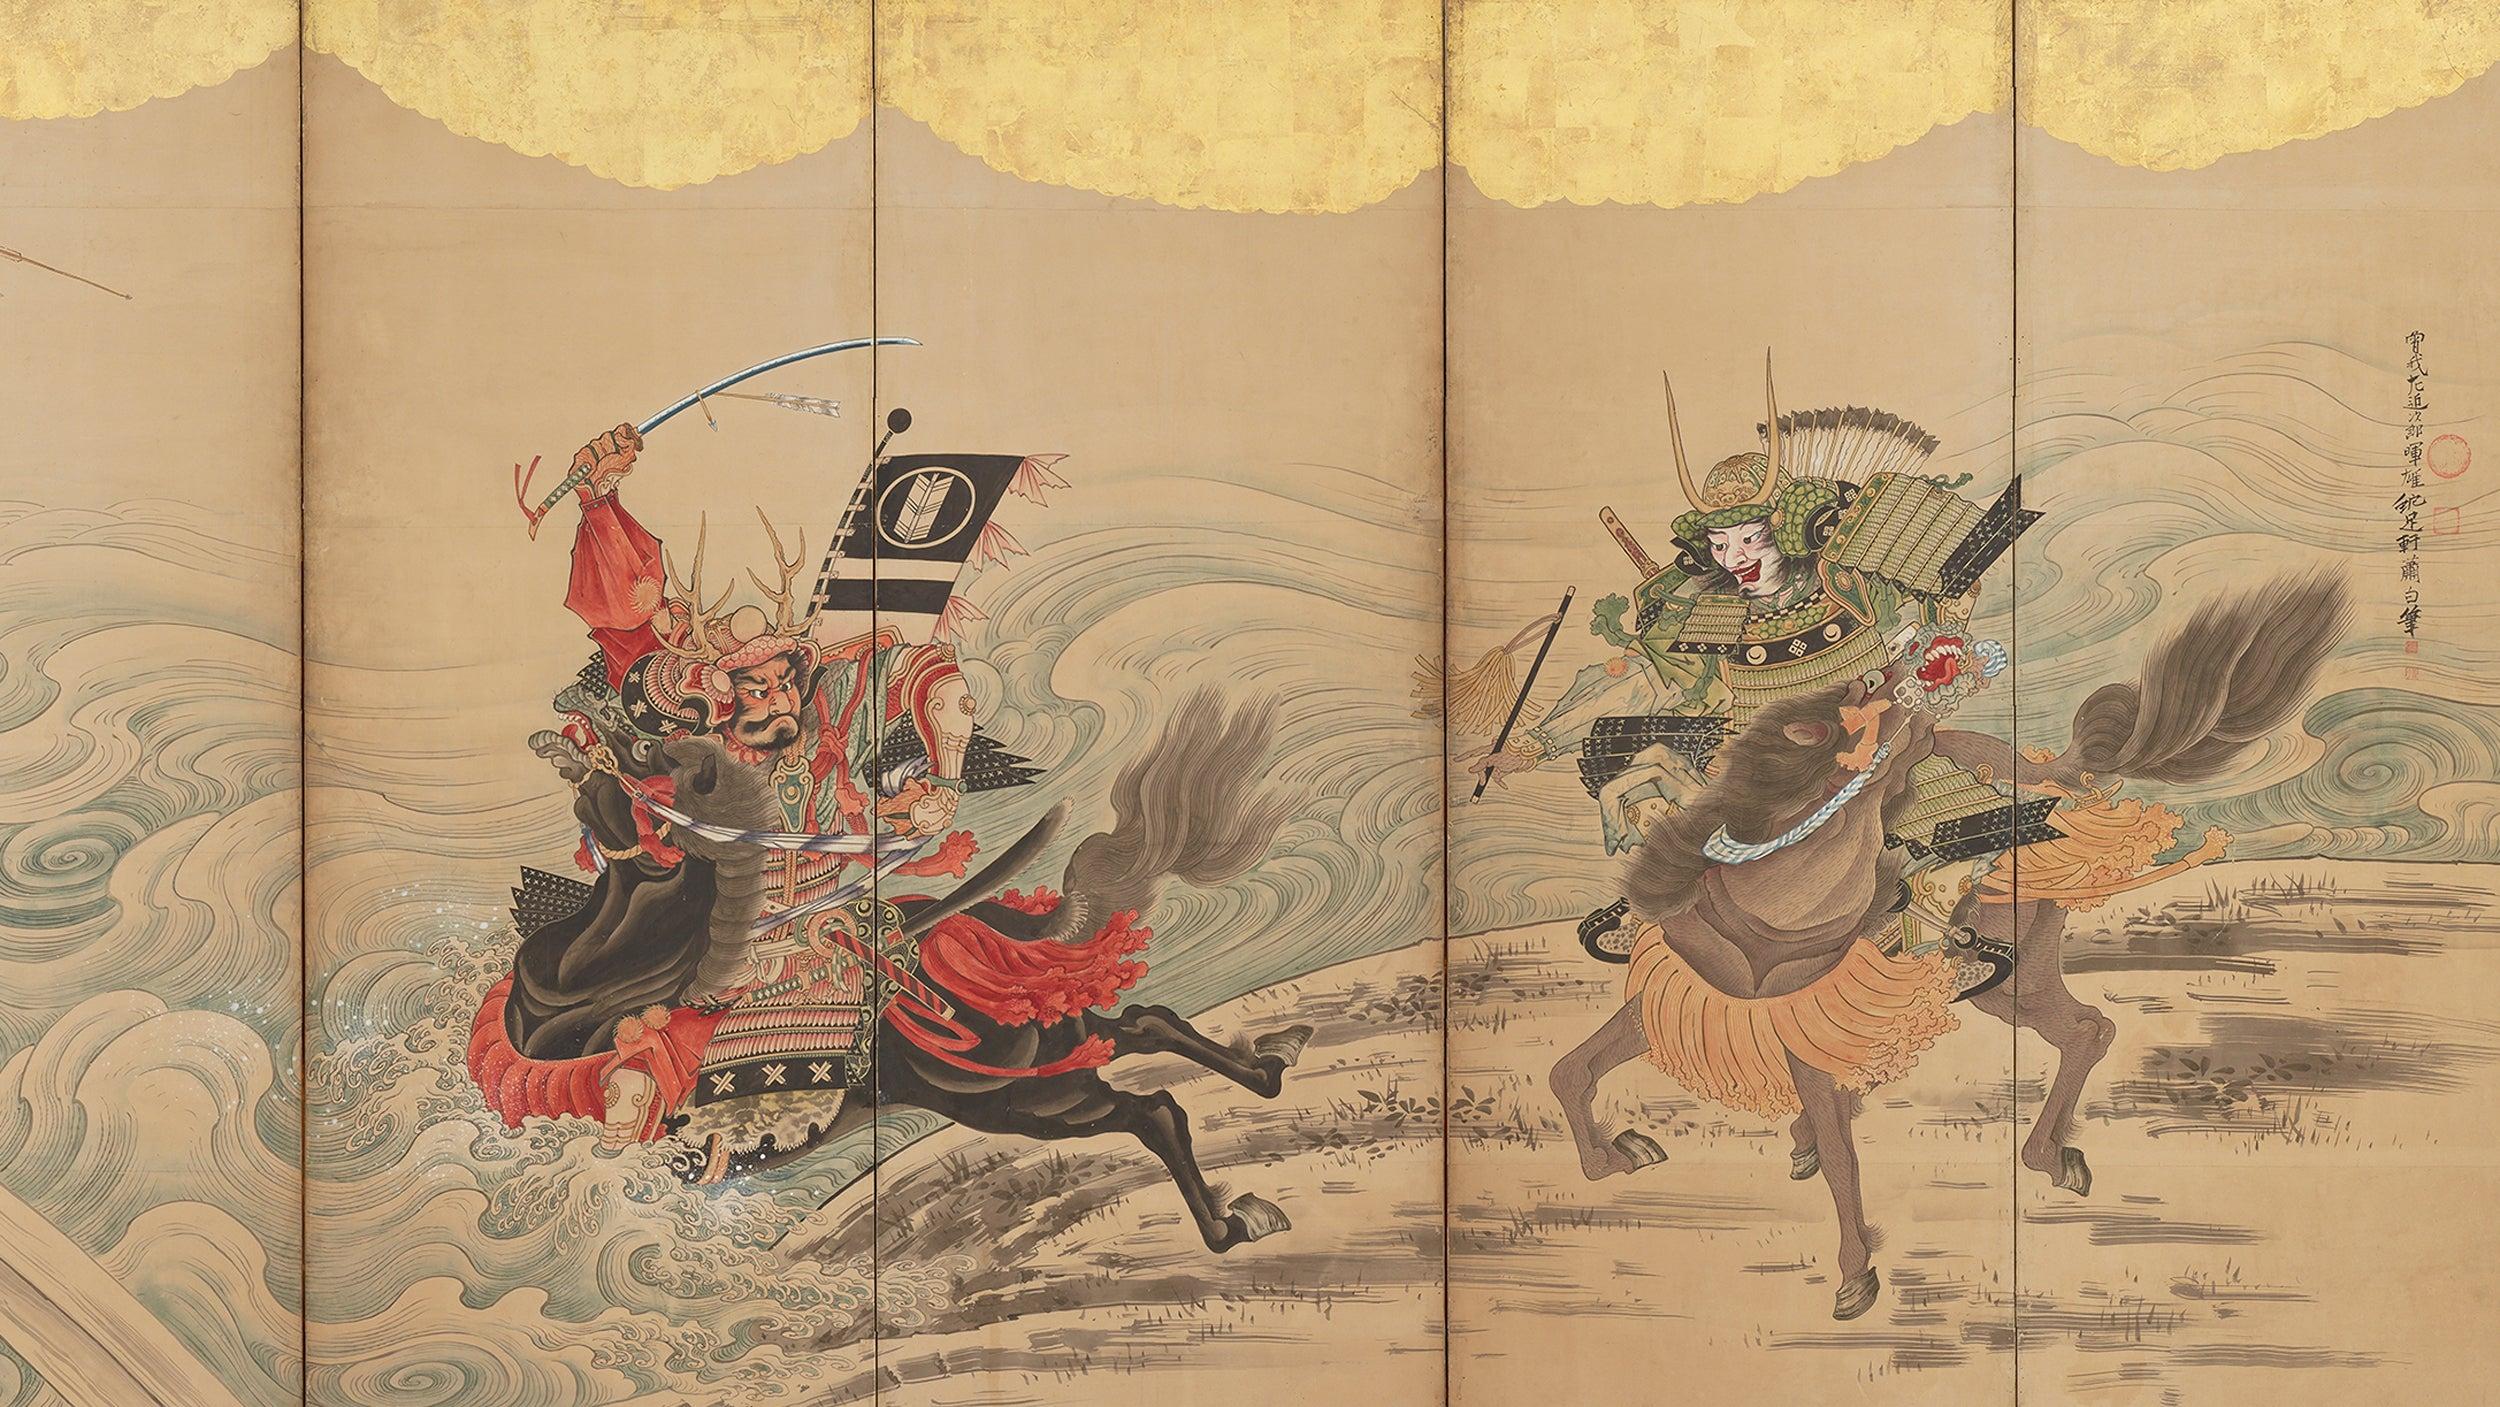 Japanese screen depicts warriors crossing river on horseback.